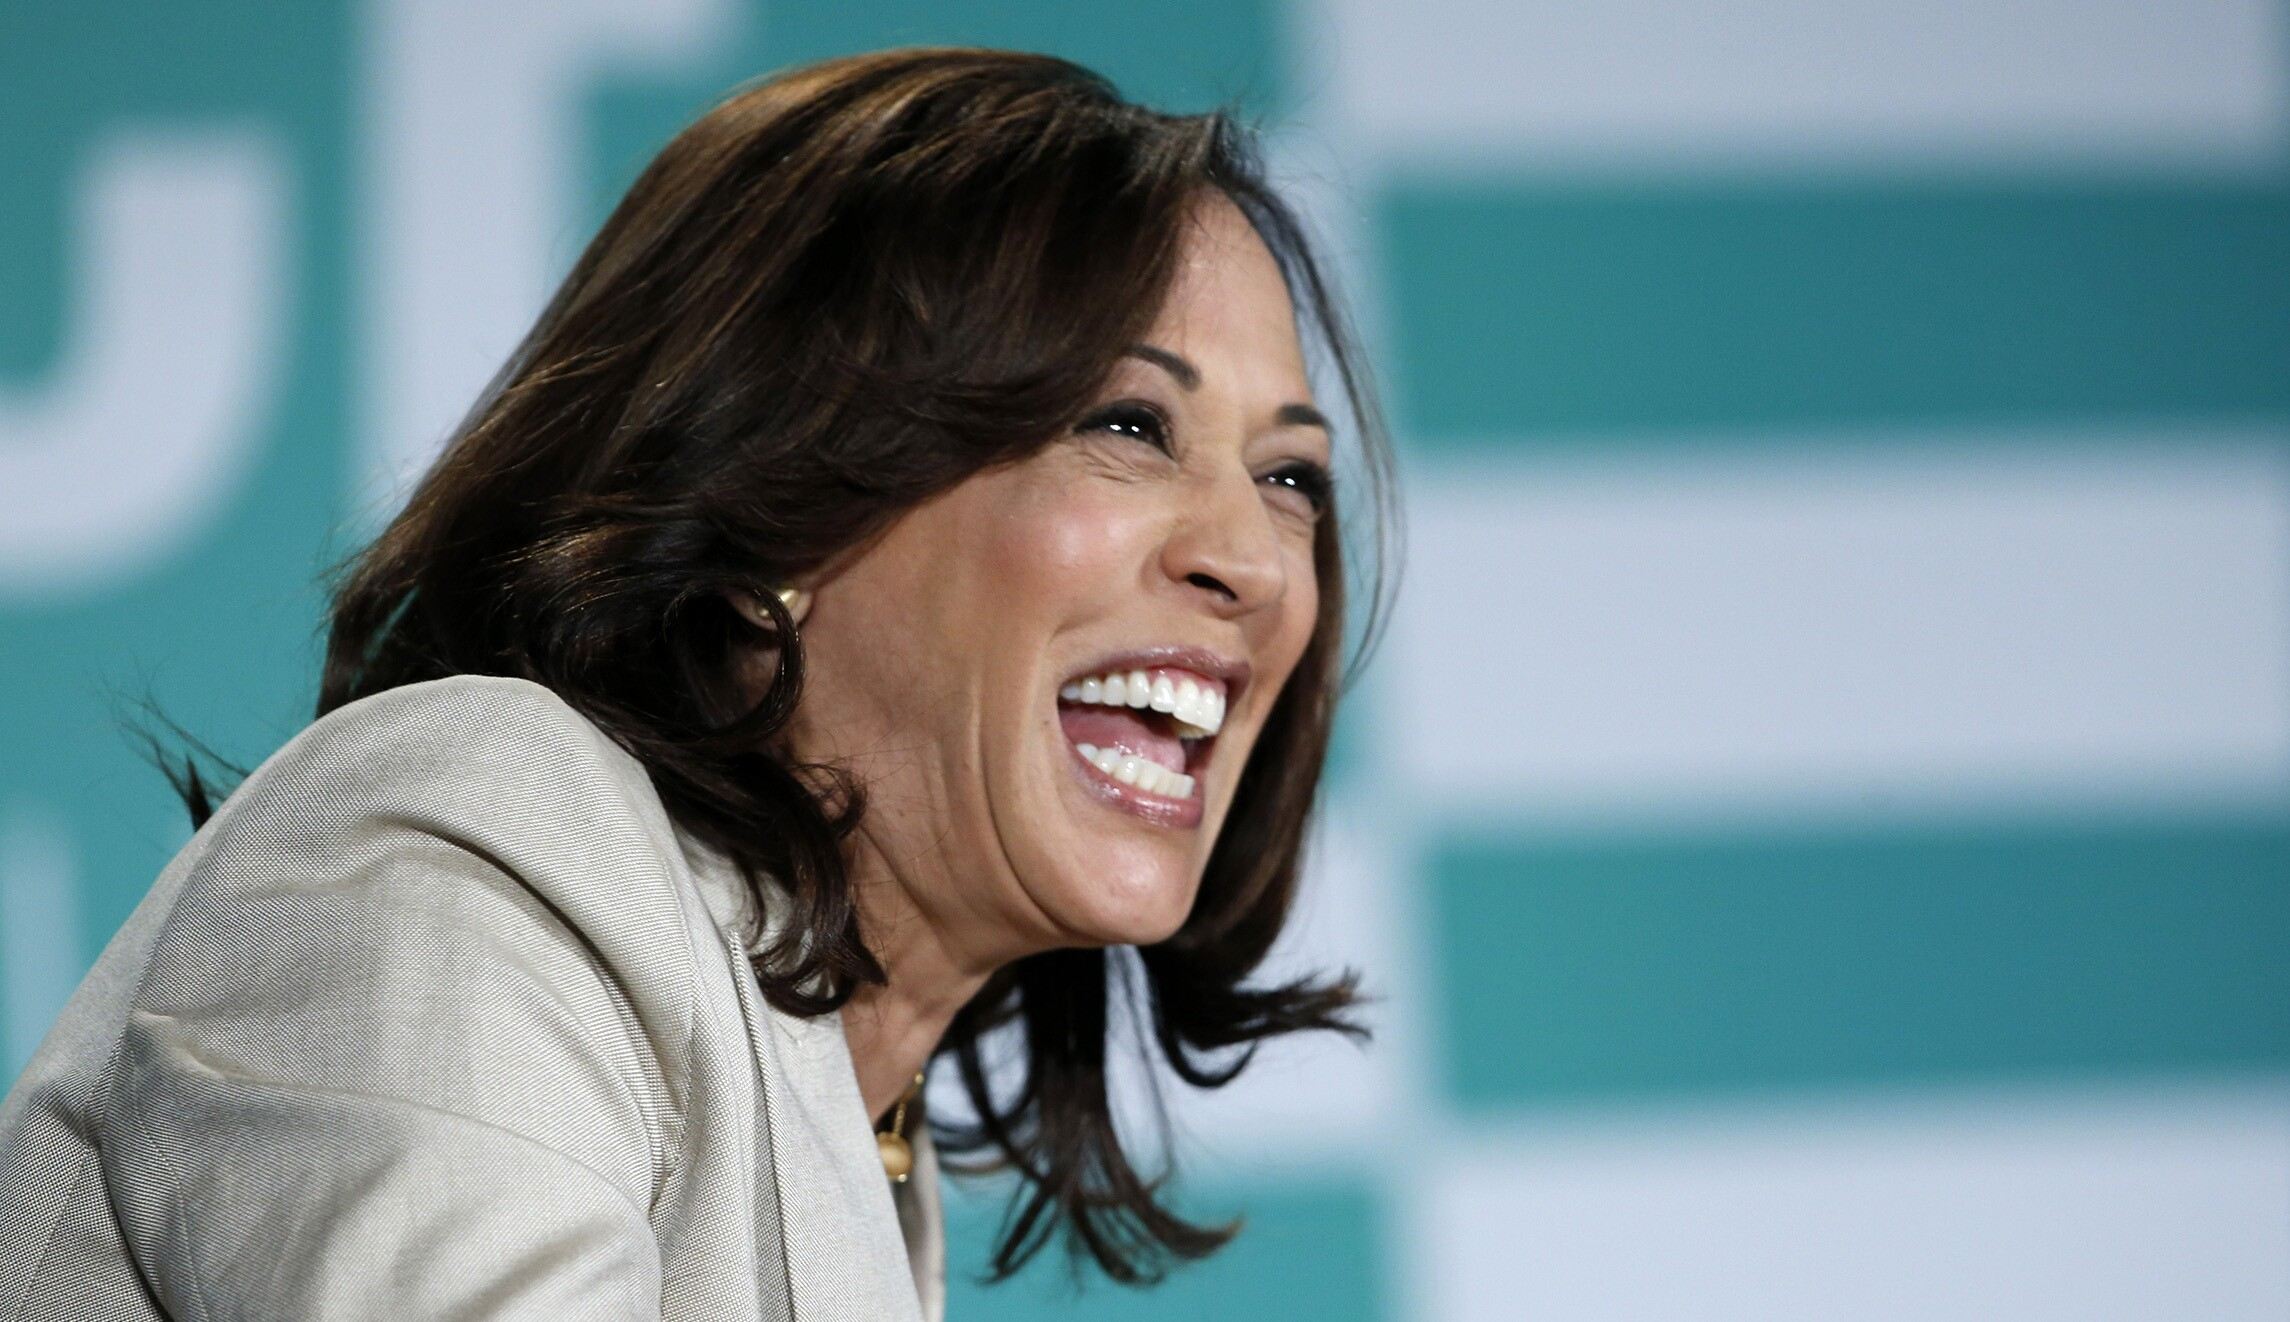 Democratic presidential candidate Sen. Kamala Harris, D-California, is seen.